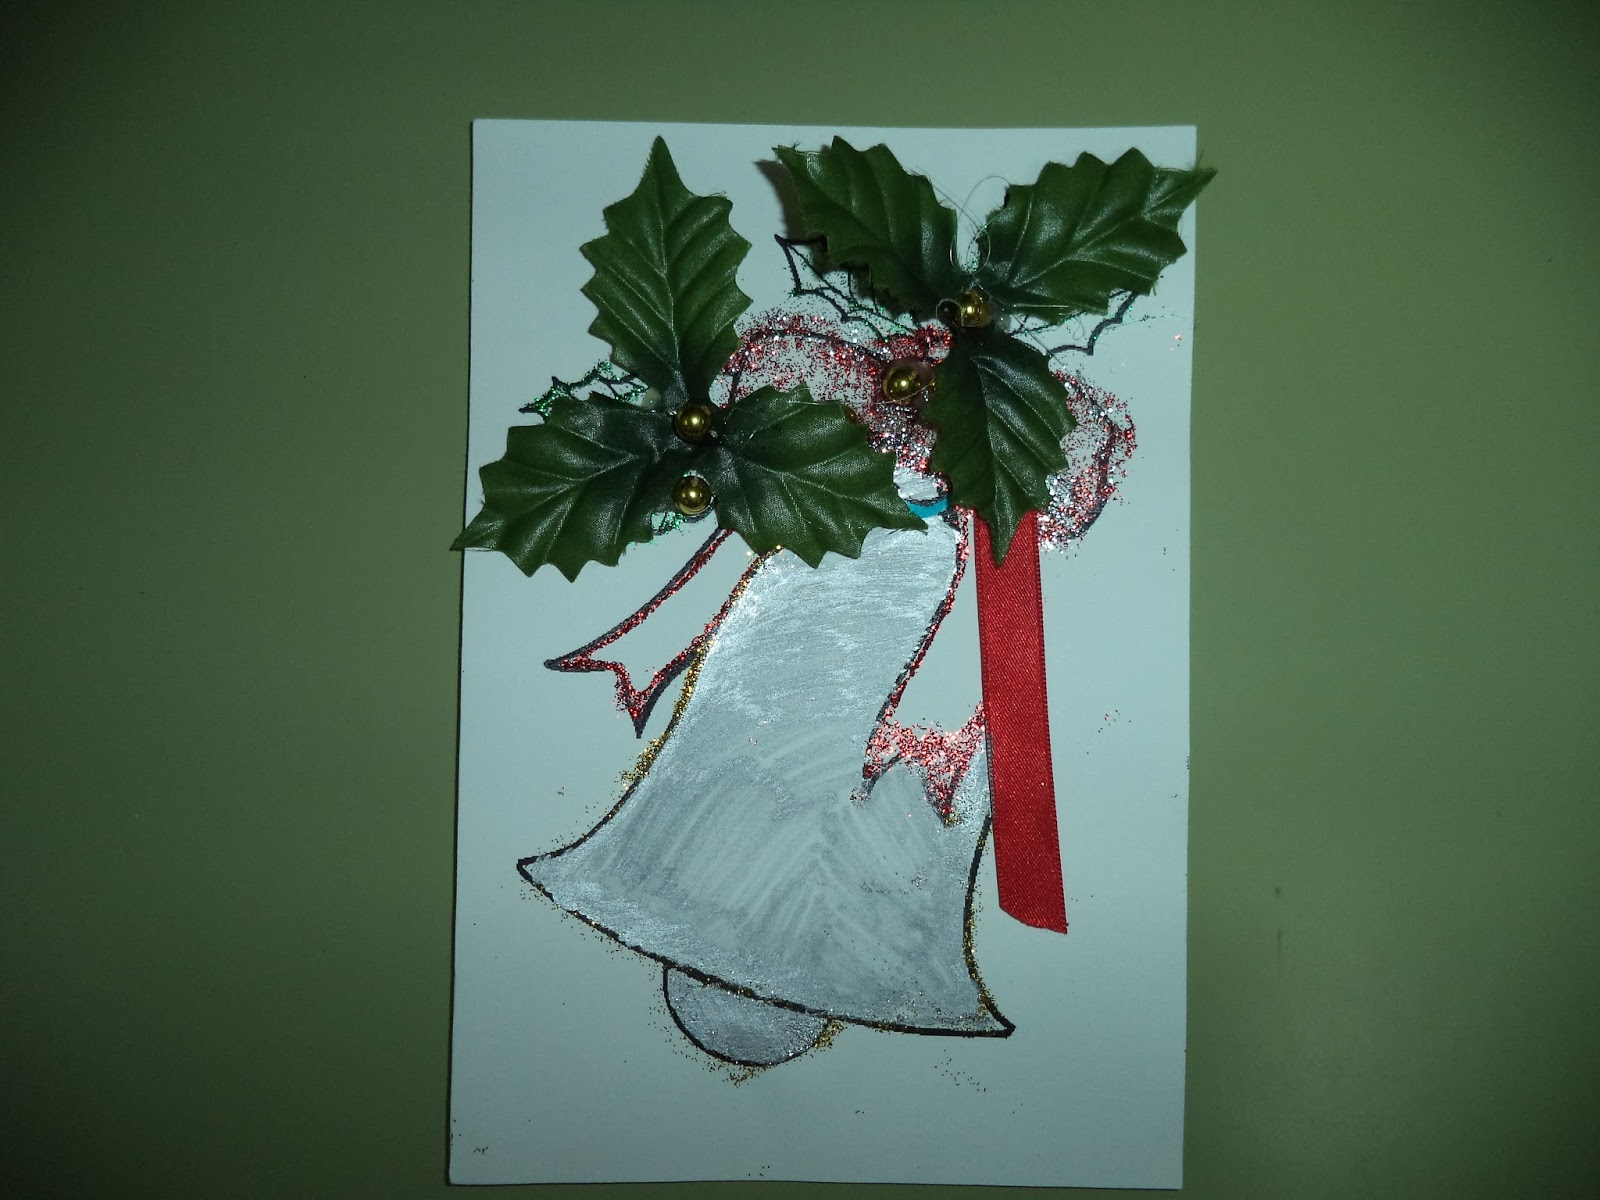 Peques da clase vermella e m is decoraci n de nadal - Adornos de nadal ...